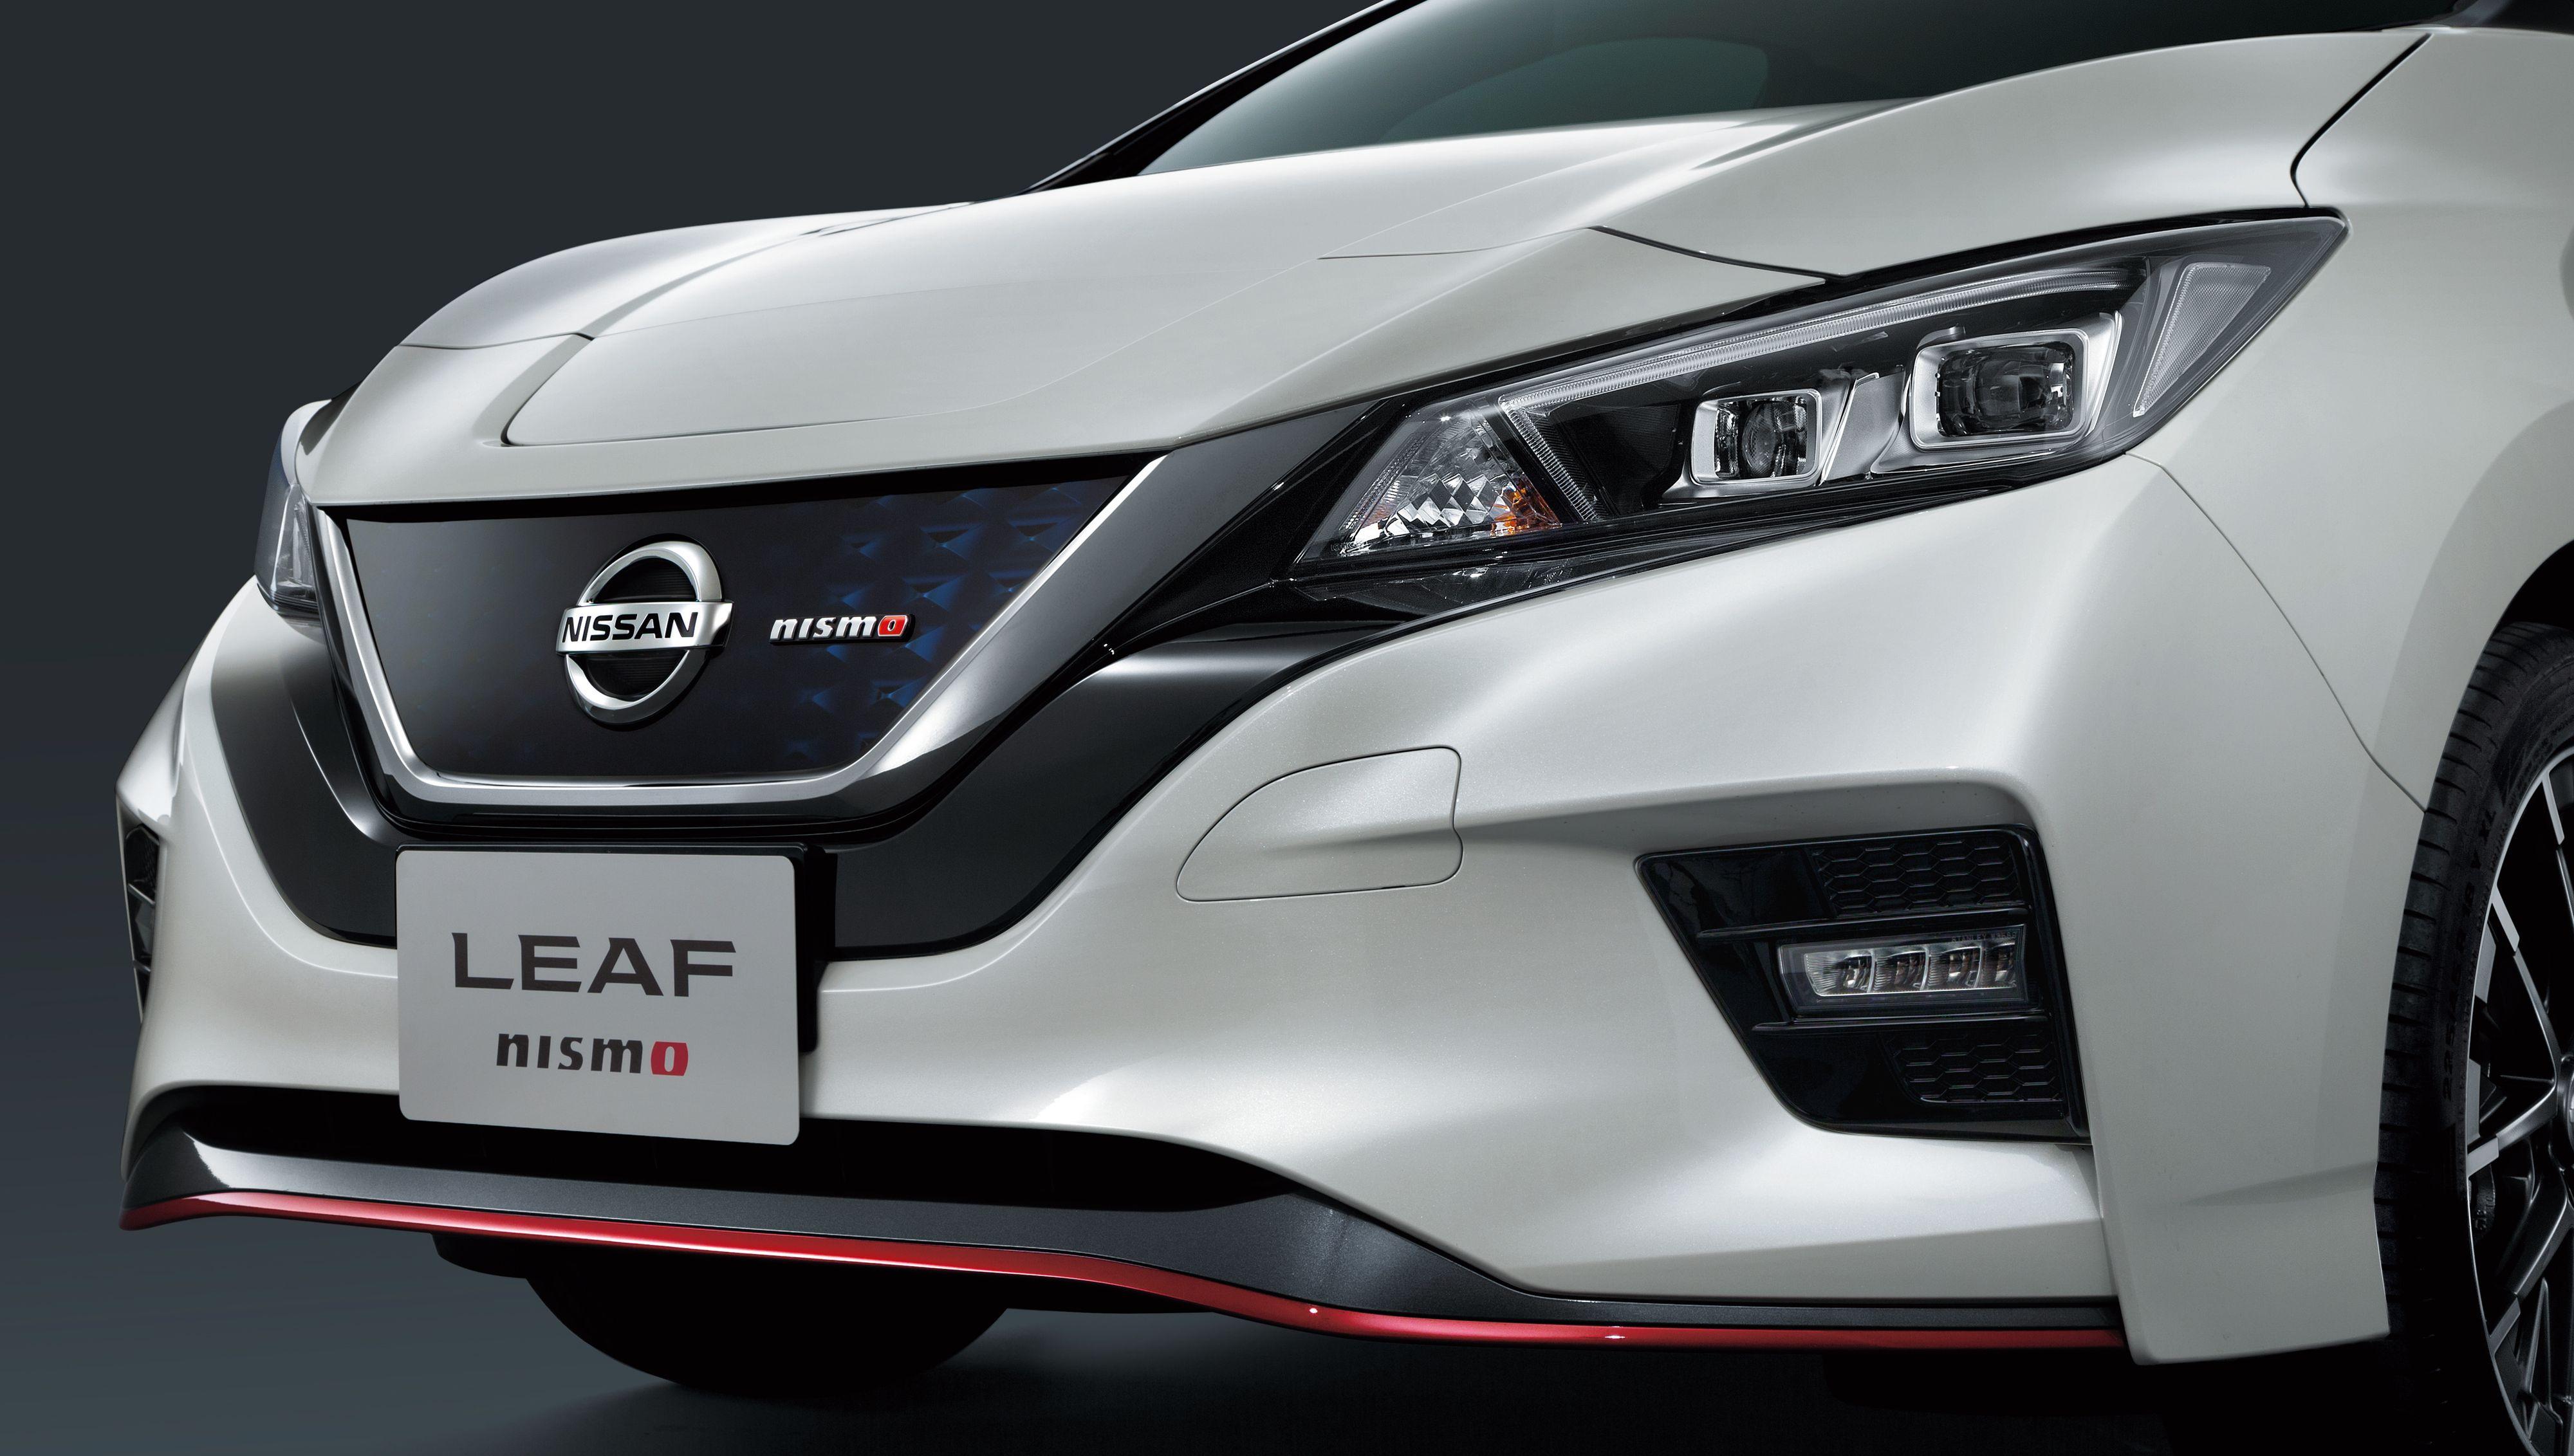 Nissan Leaf Nismo har redesignet grill, blant annet.